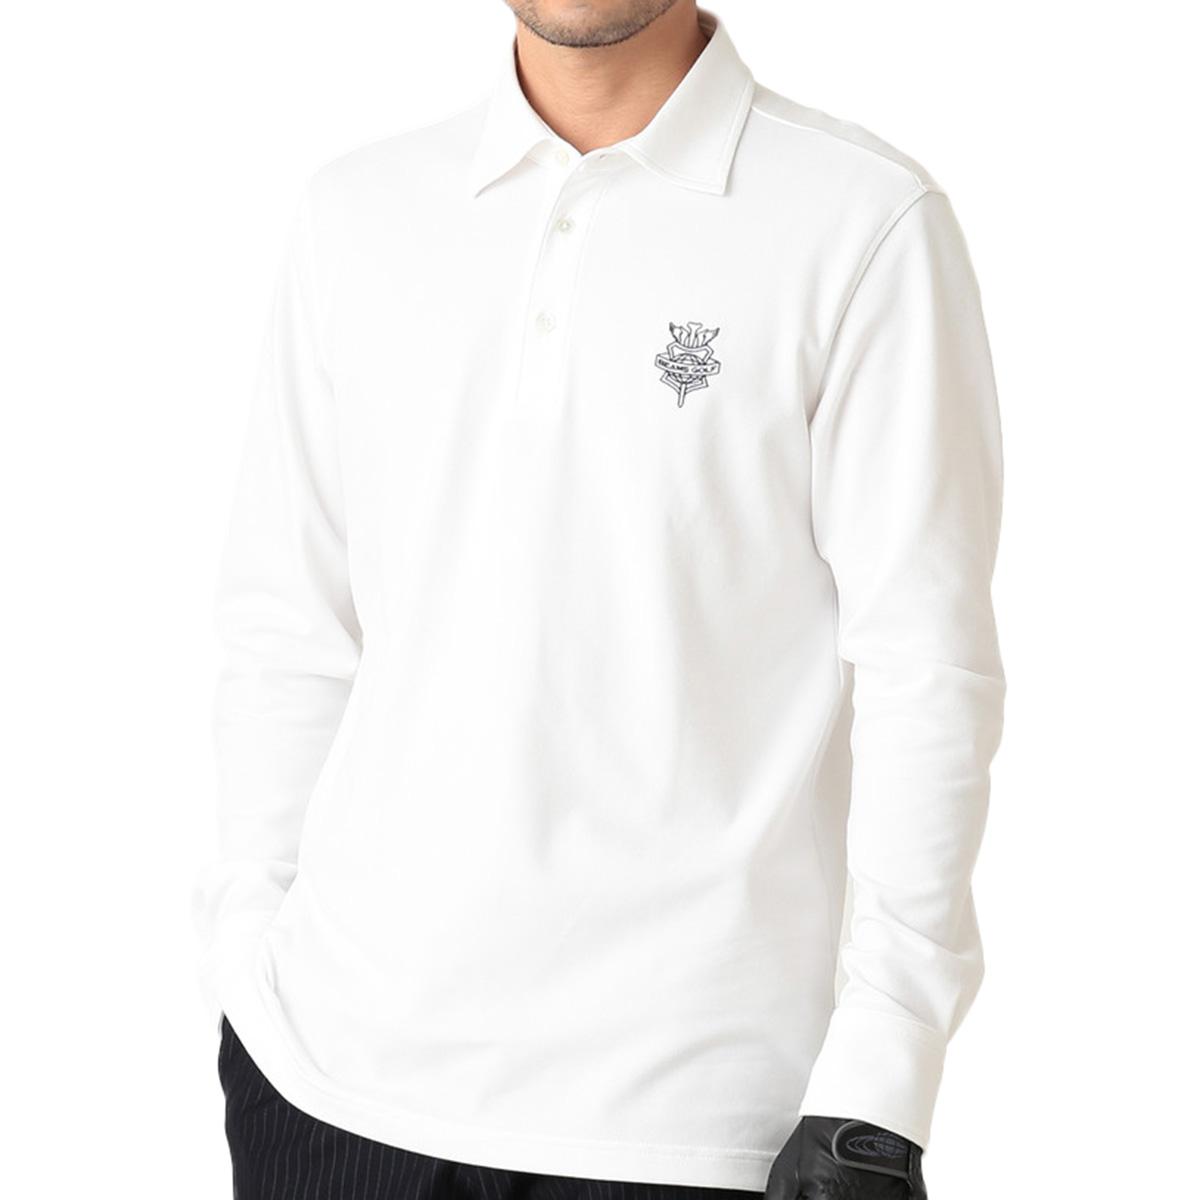 BEAMS GOLF PURPLE LABEL 長袖鹿の子ポロシャツ